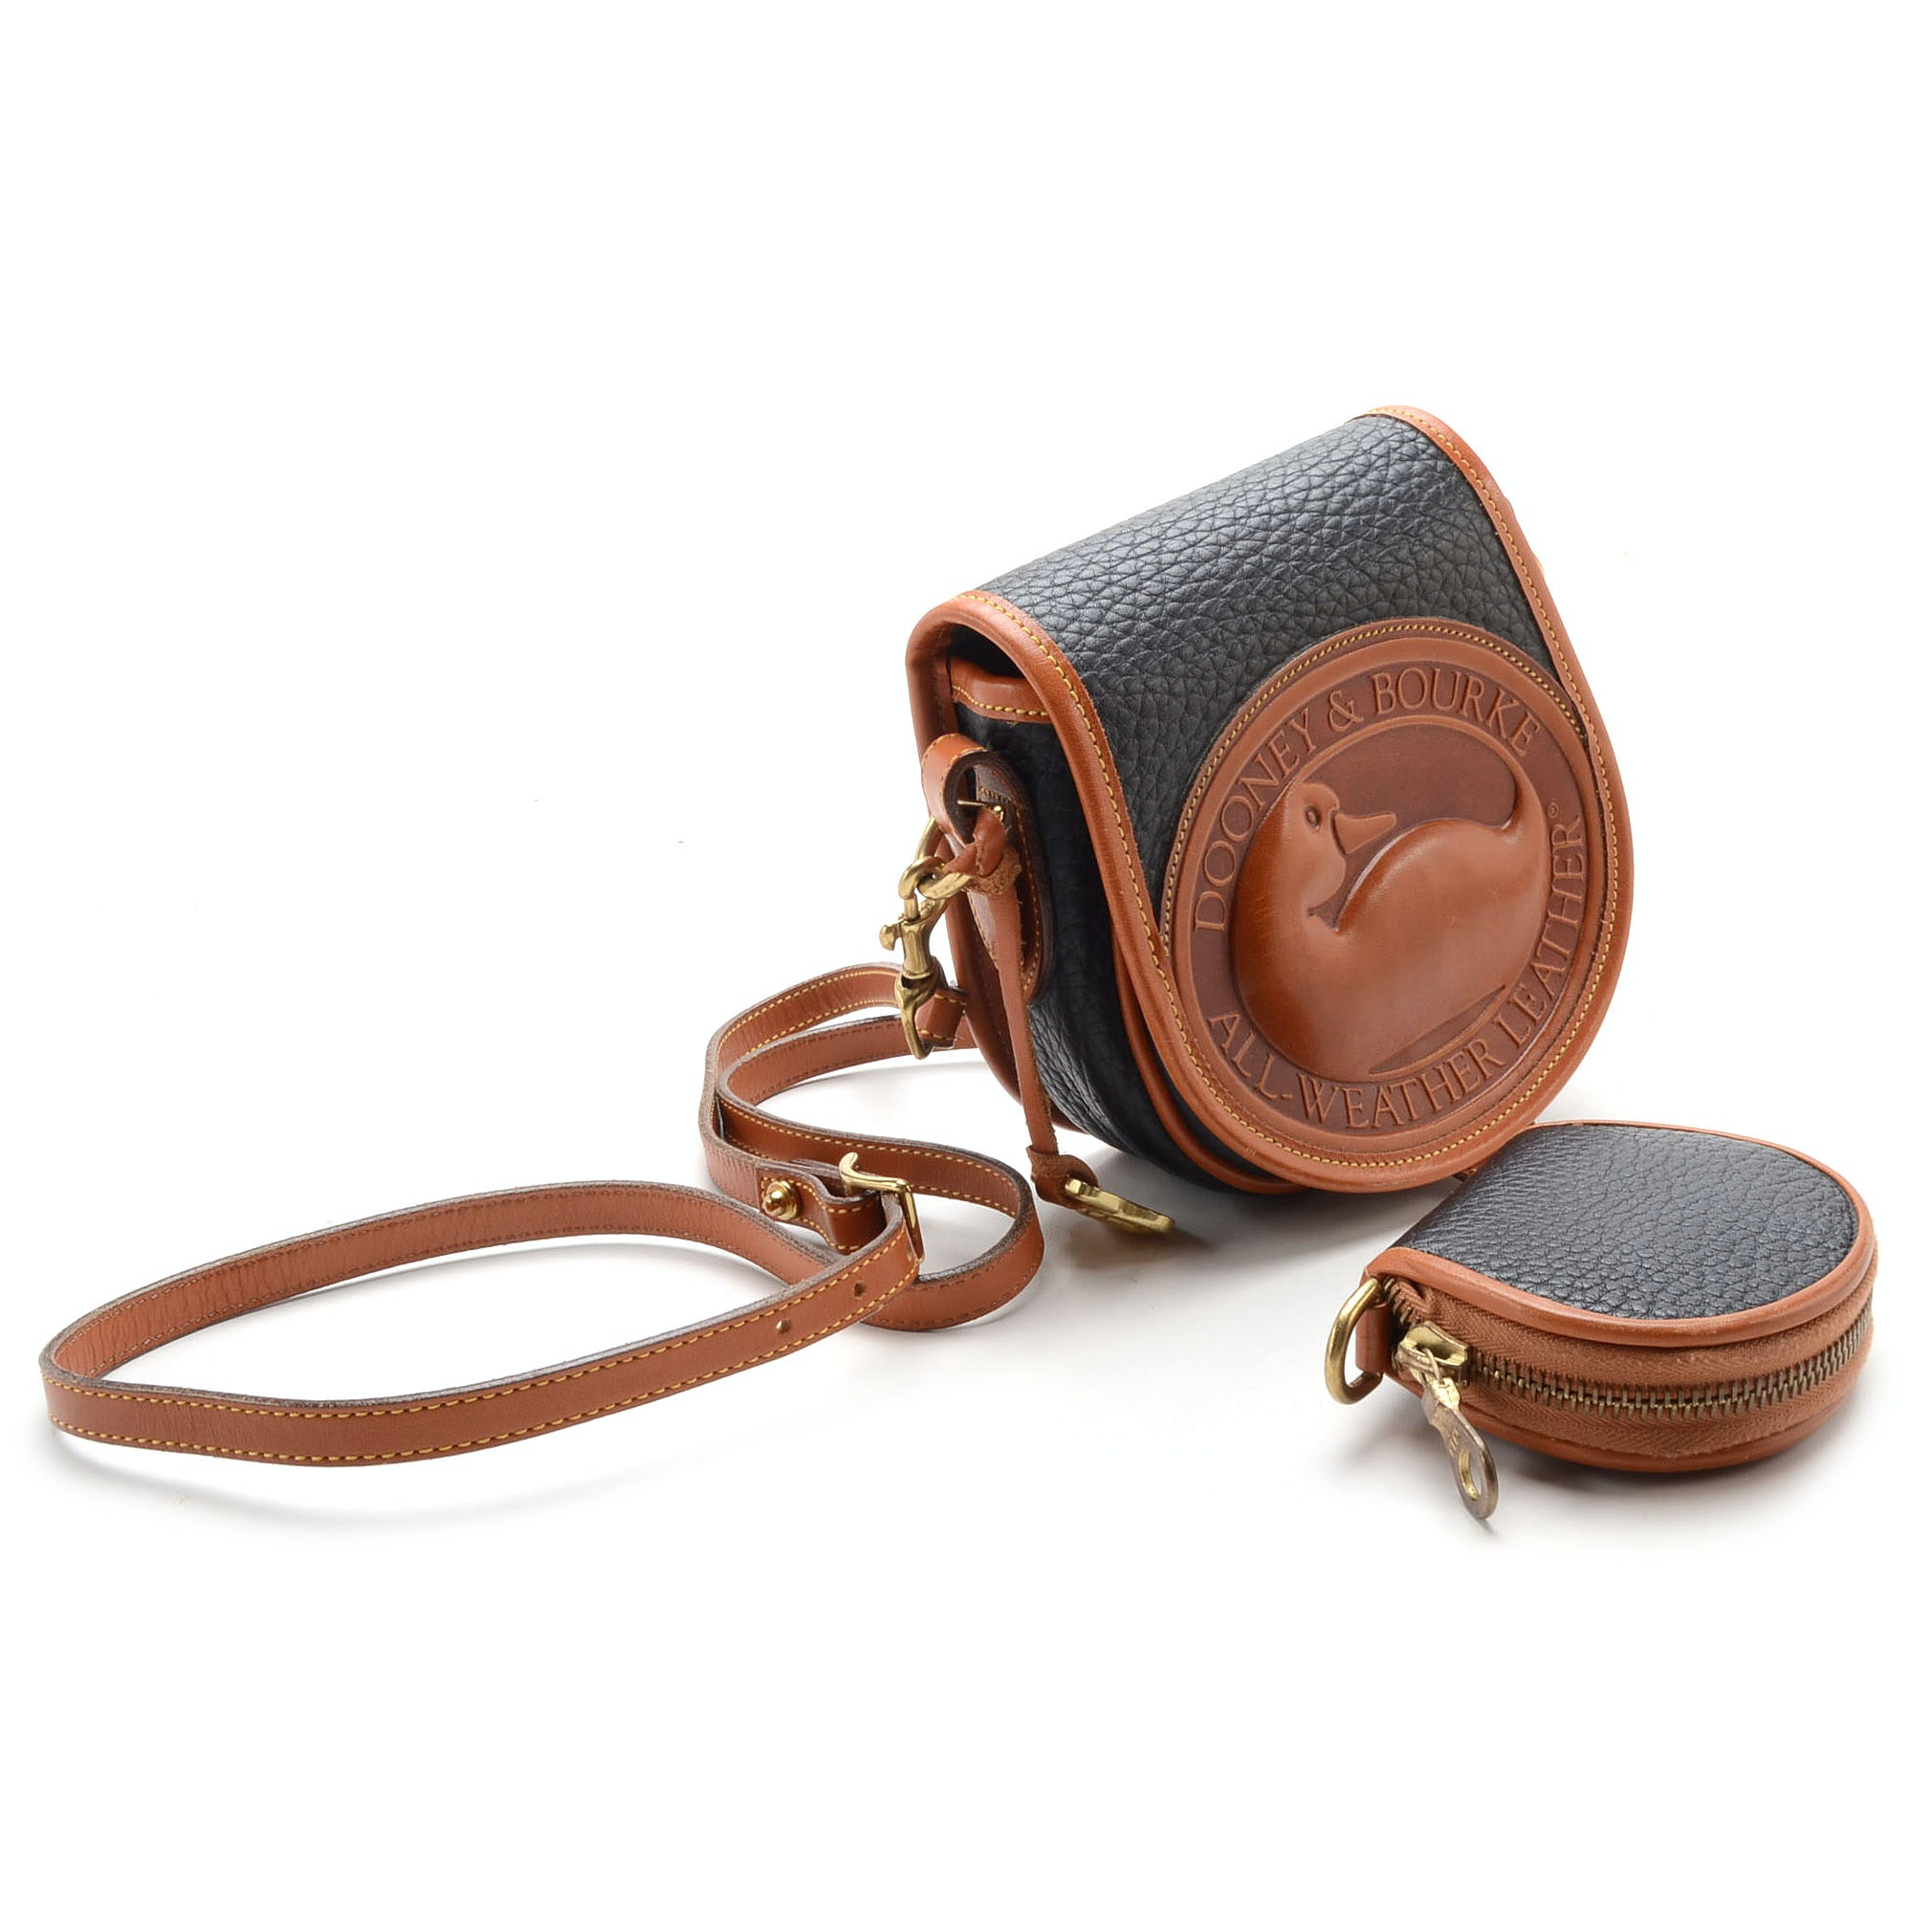 Vintage Dooney \u0026 Bourke Small Duck Crossbody Bag and Coin Purse